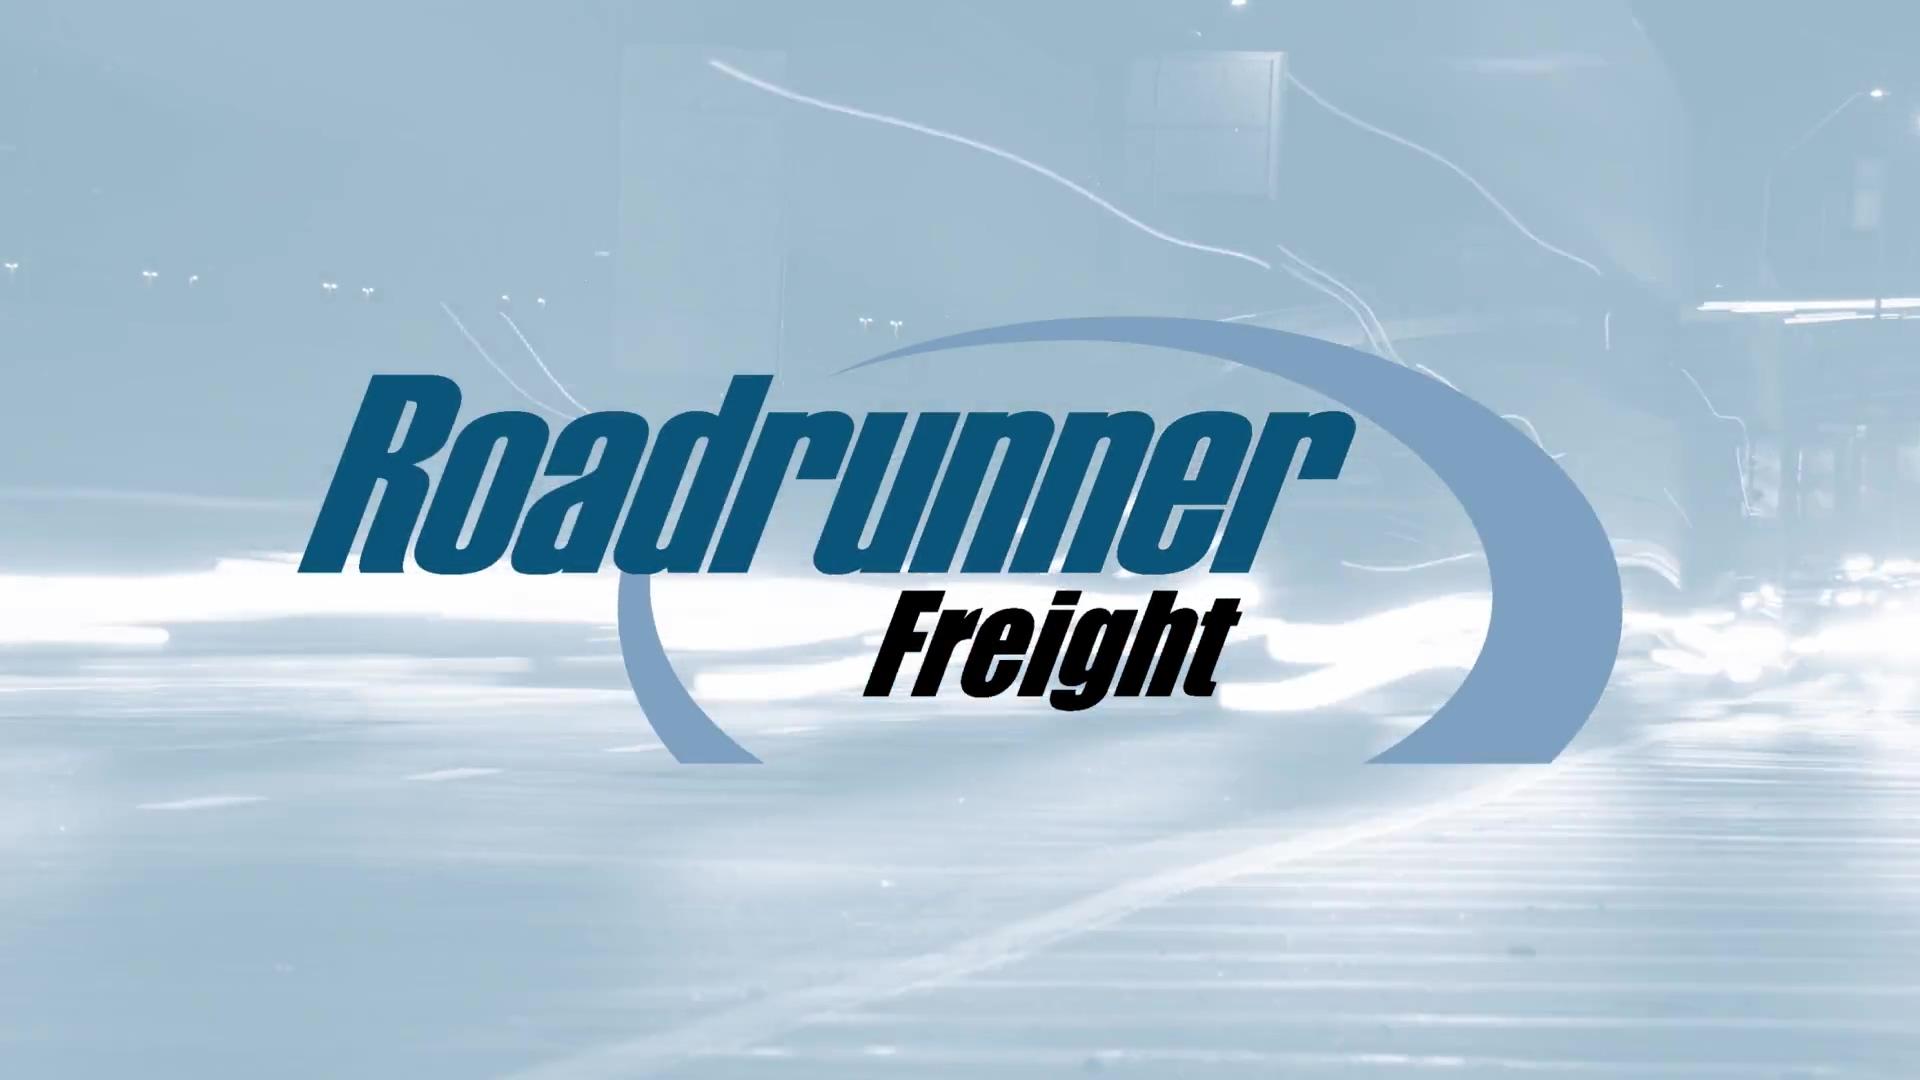 AboutRoardunnerFreight-MediumCompression-GoodForYouTube-Vimeo-WebUpload